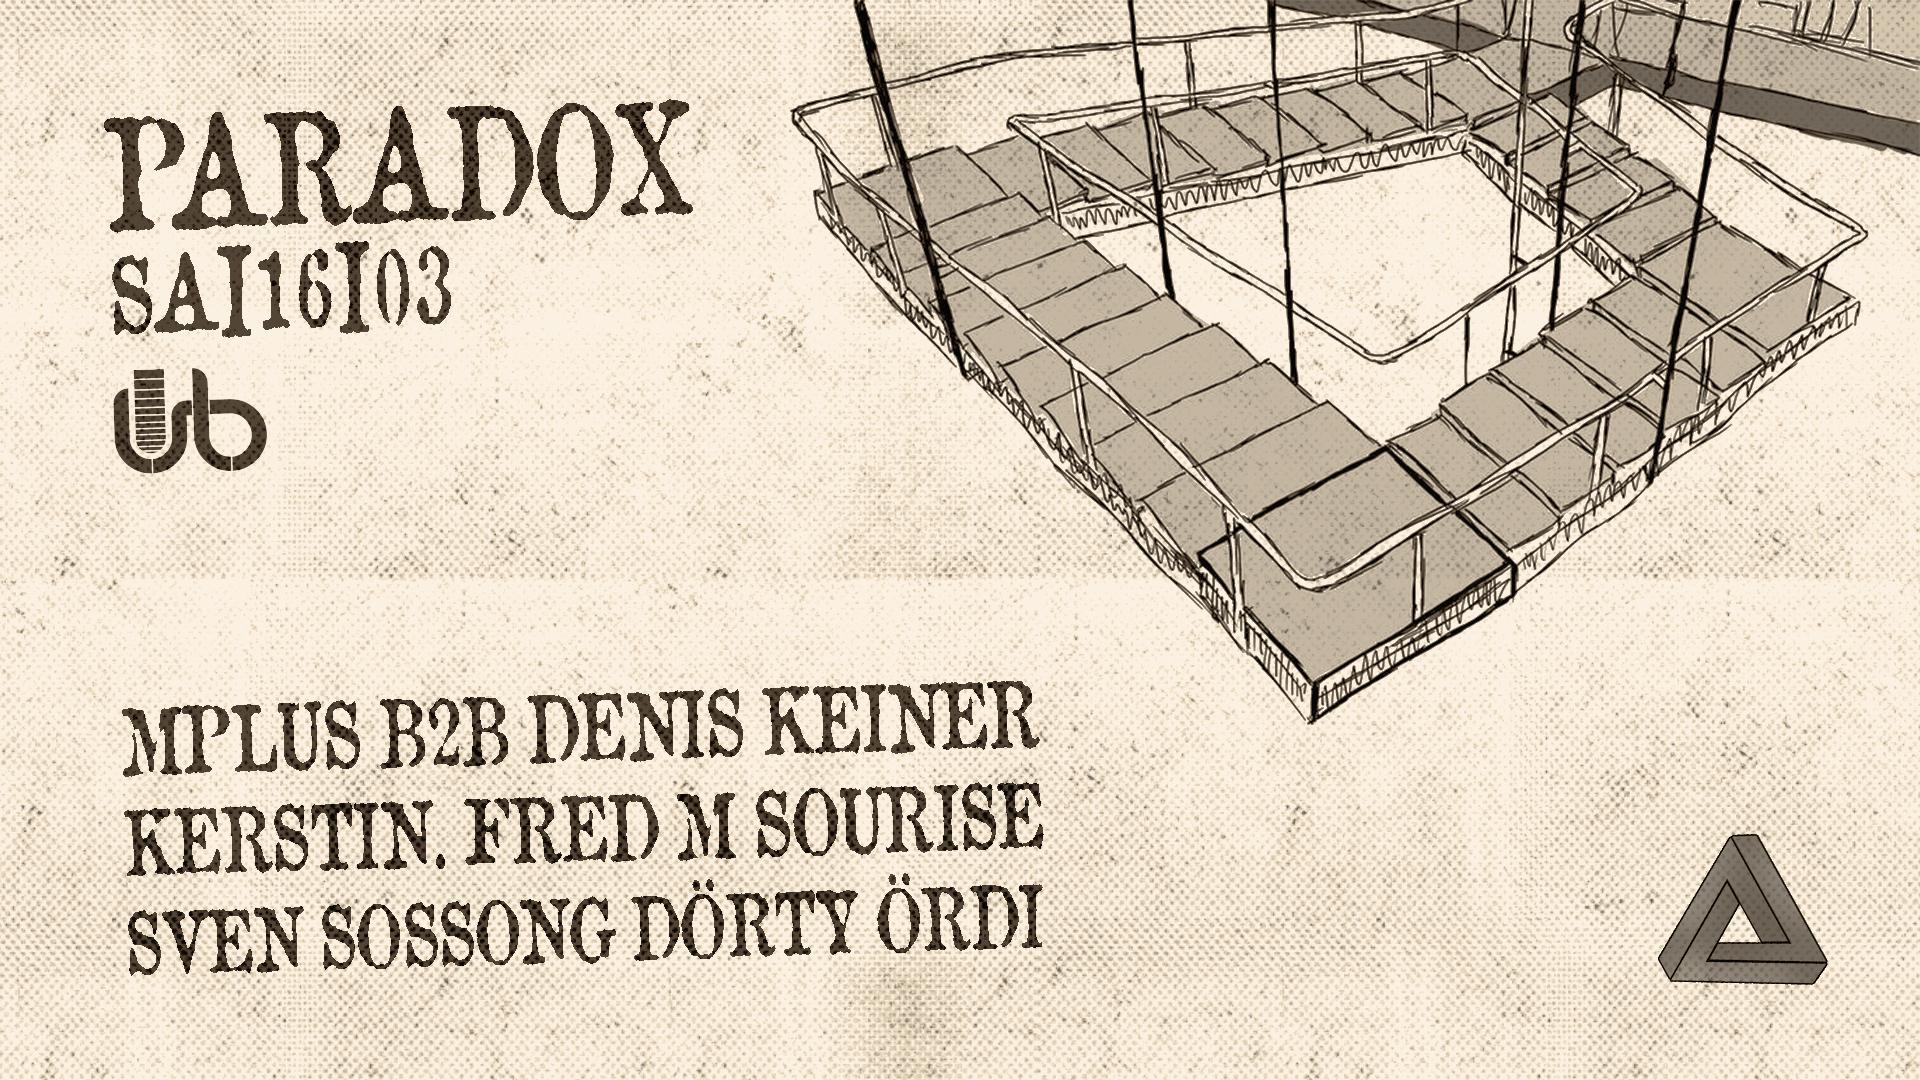 Paradox | UBAR - Dort wo alles anfing.